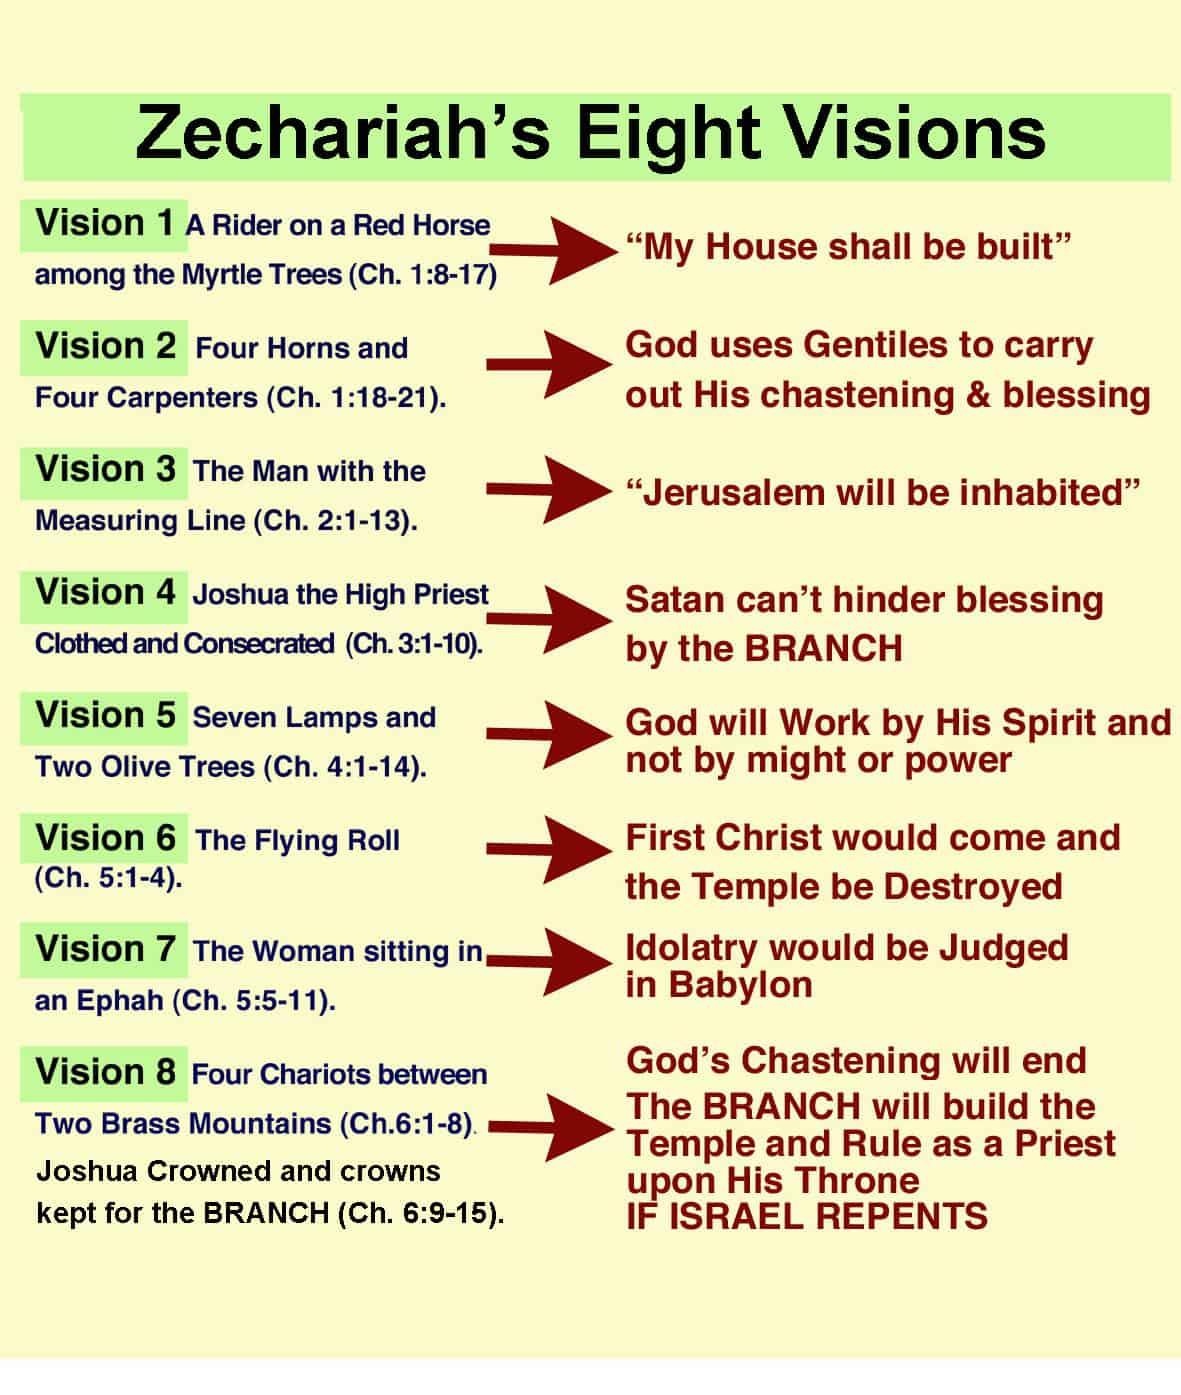 Zechariah Visions - The Herald of Hope